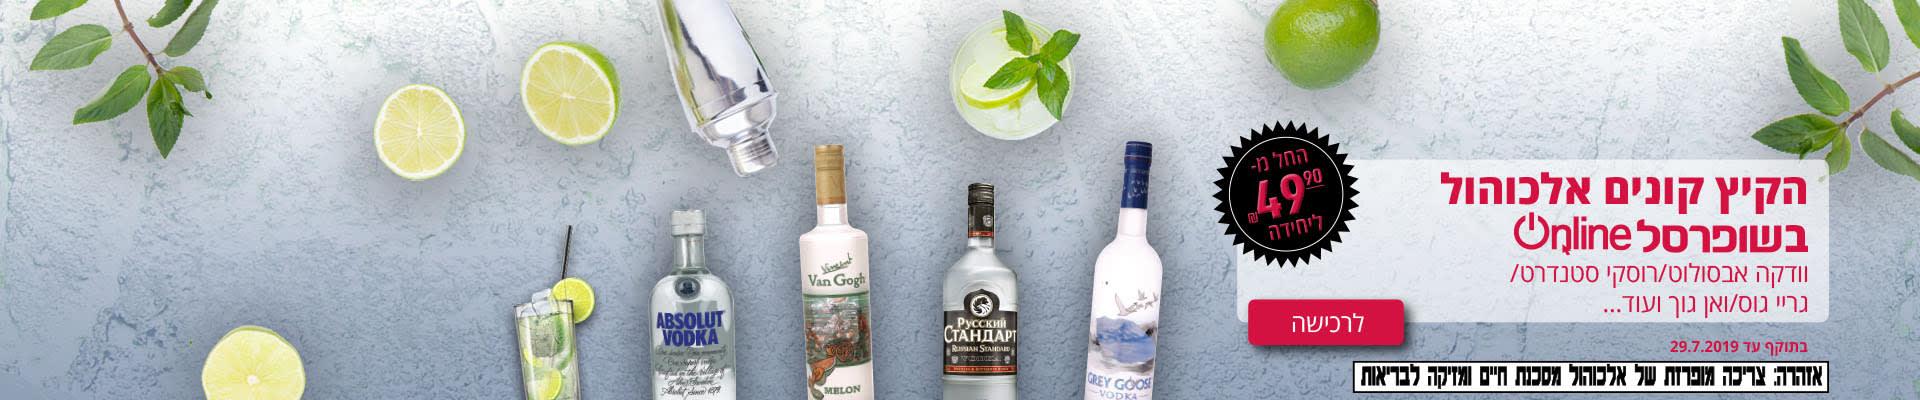 vodka-2.jpg